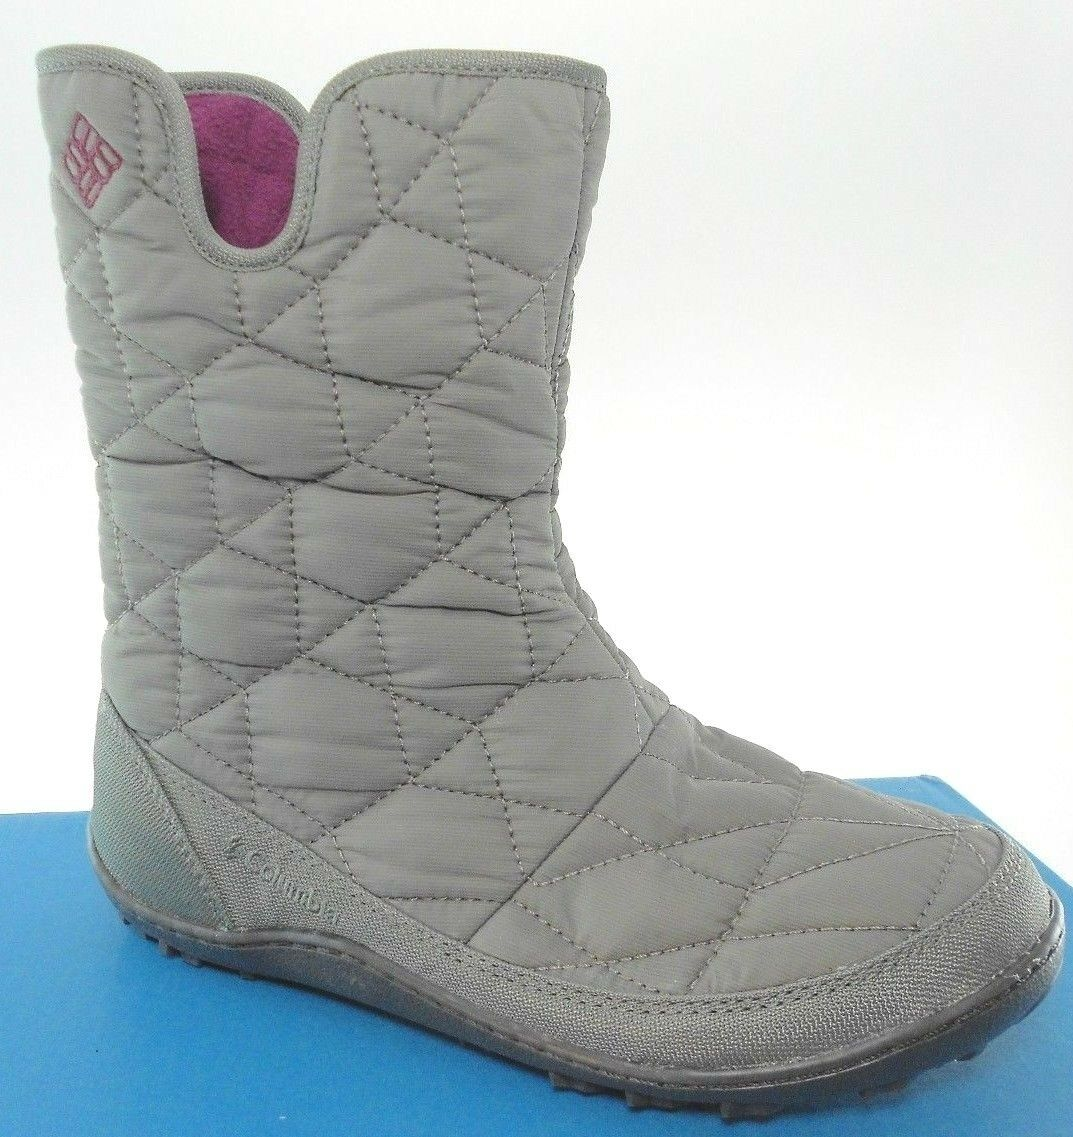 COLUMBIA POWDER SUMMIT SLIP WOMEN'S WATERPROOF INSULATED ZIP BOOTS, YL5310-052